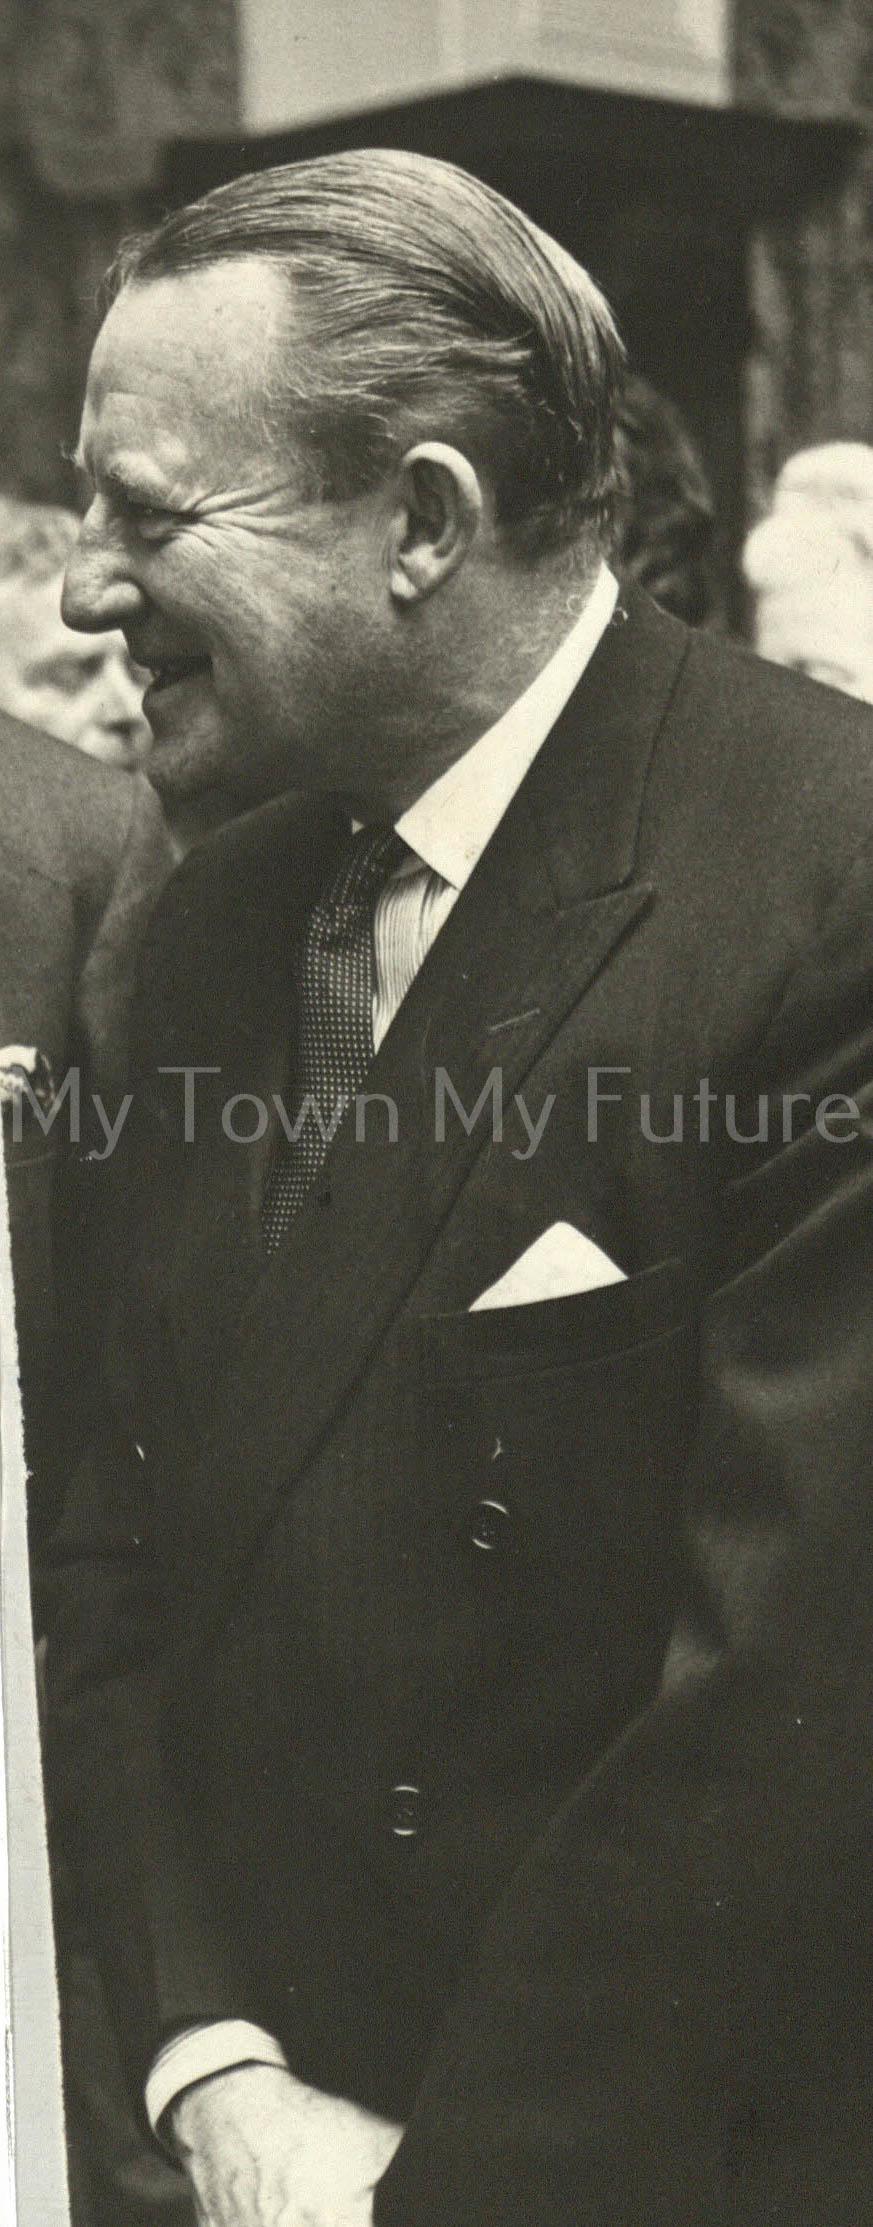 Sir John Wrightson - November 1968, Times